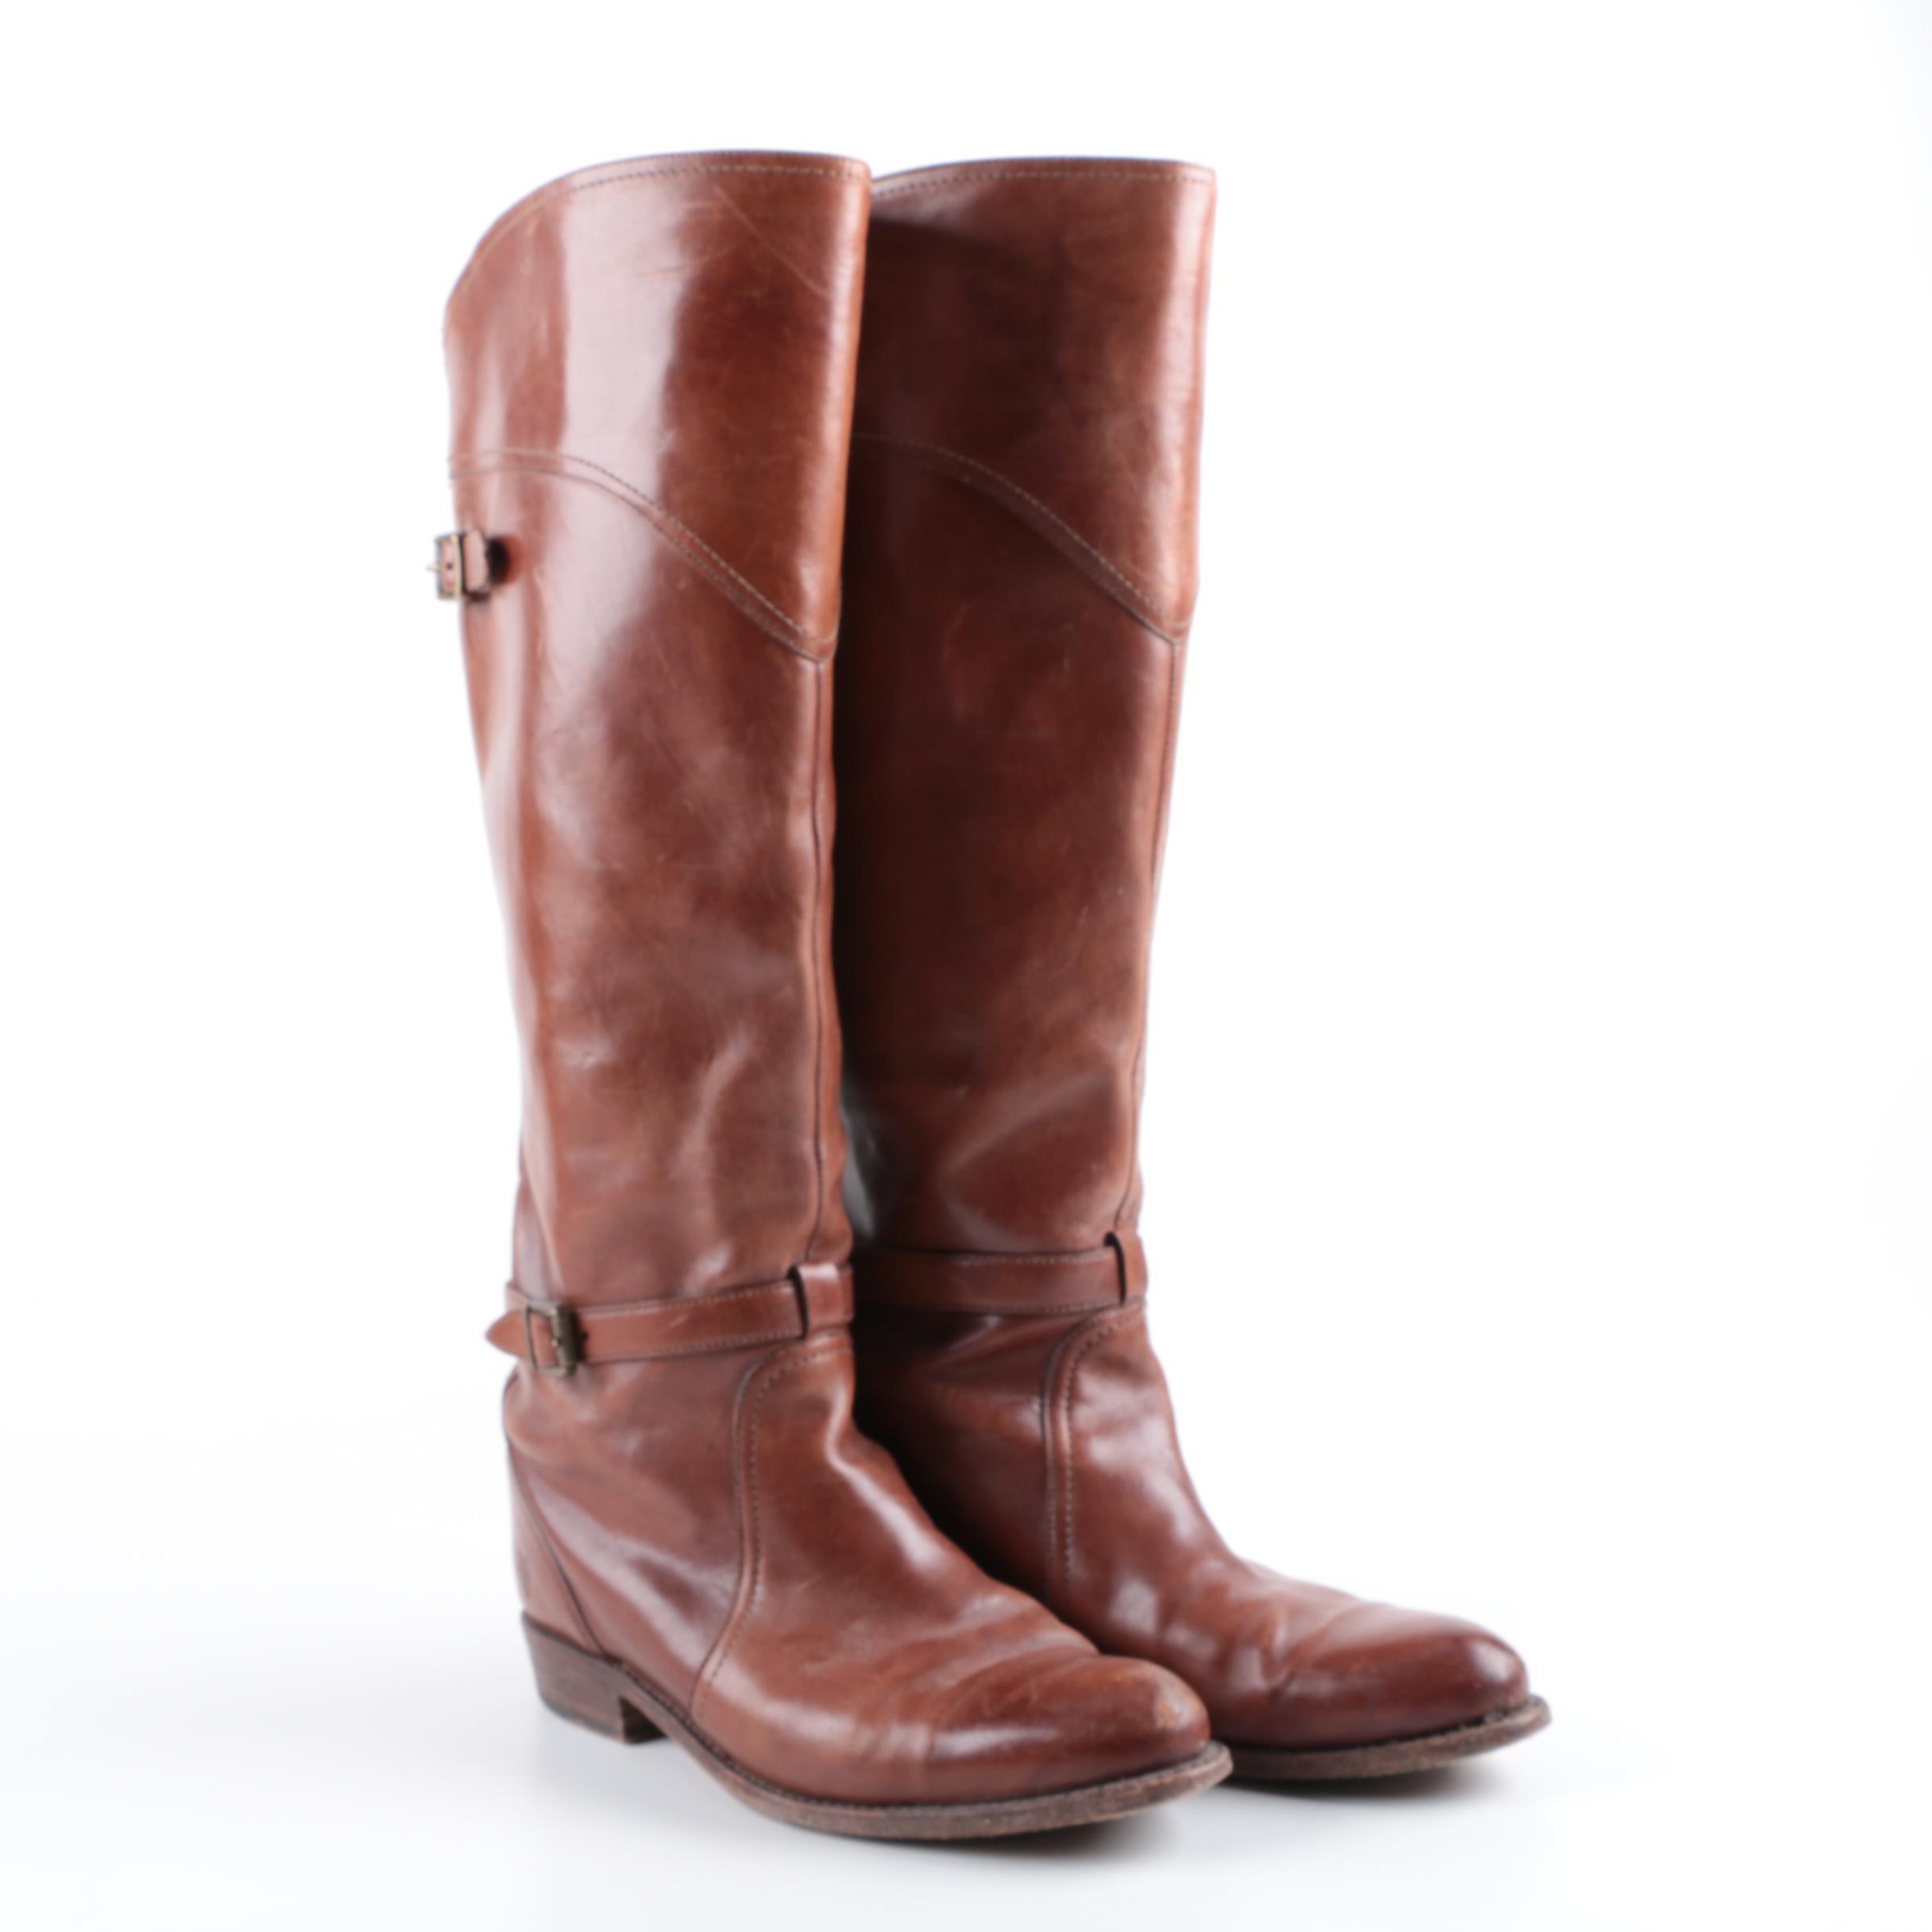 Women's Frye Dorado Whiskey Leather Riding Boots